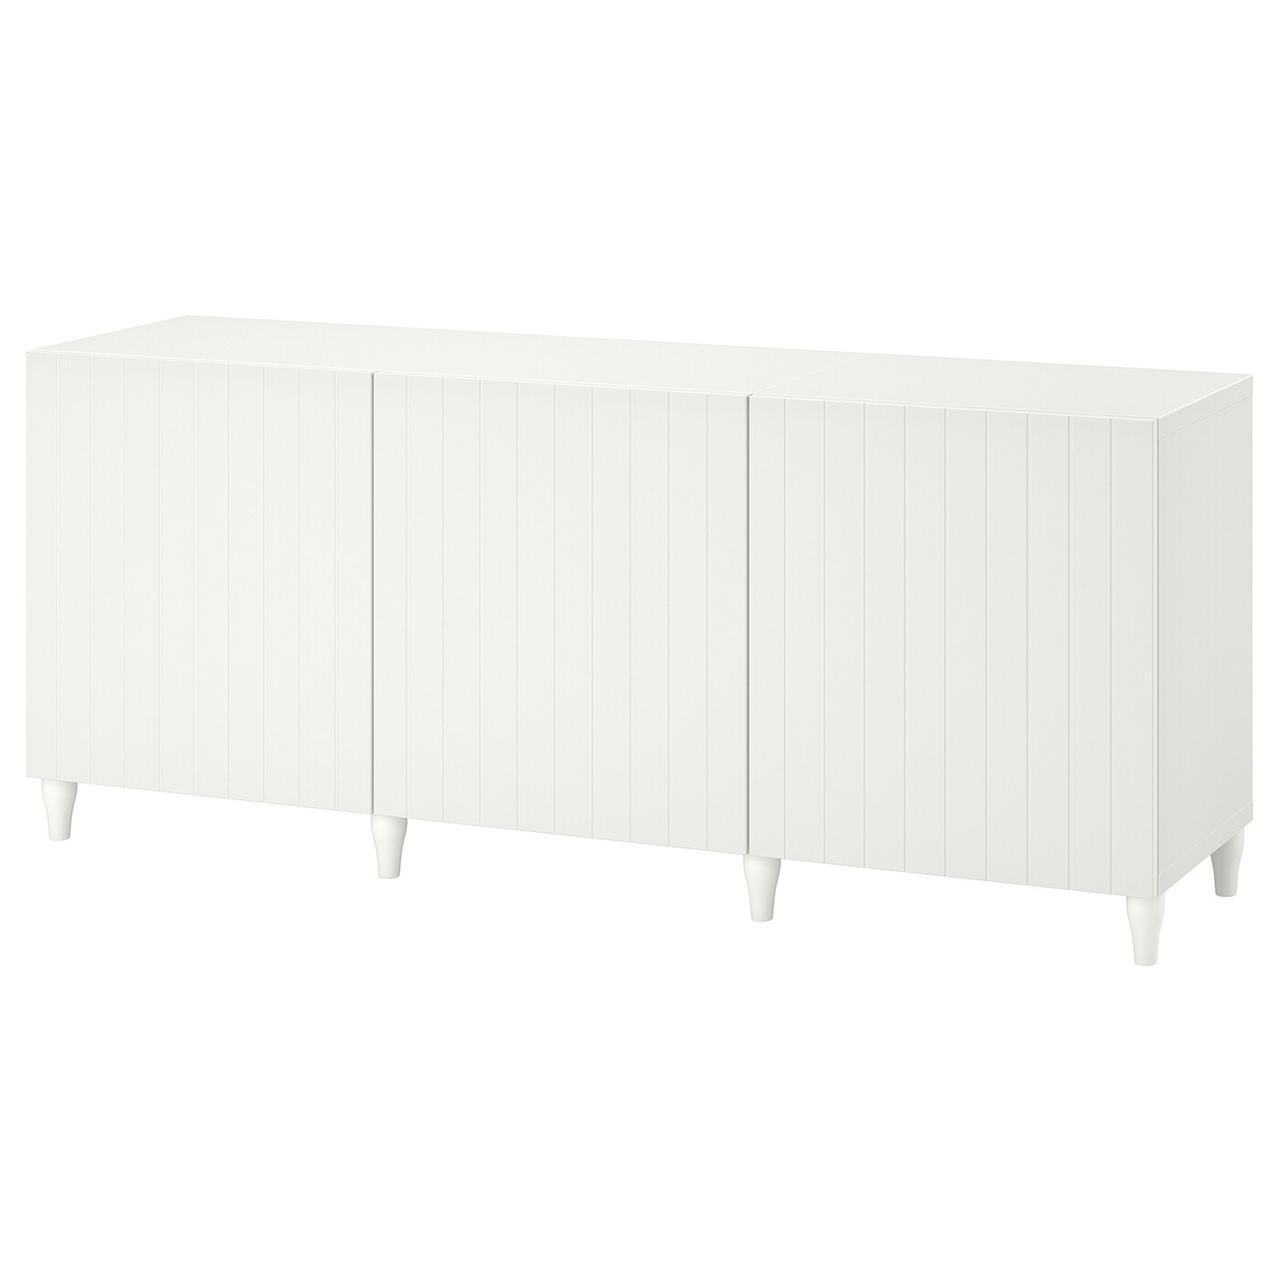 IKEA BESTÅ Комбинация с дверцами 180x42x74 см